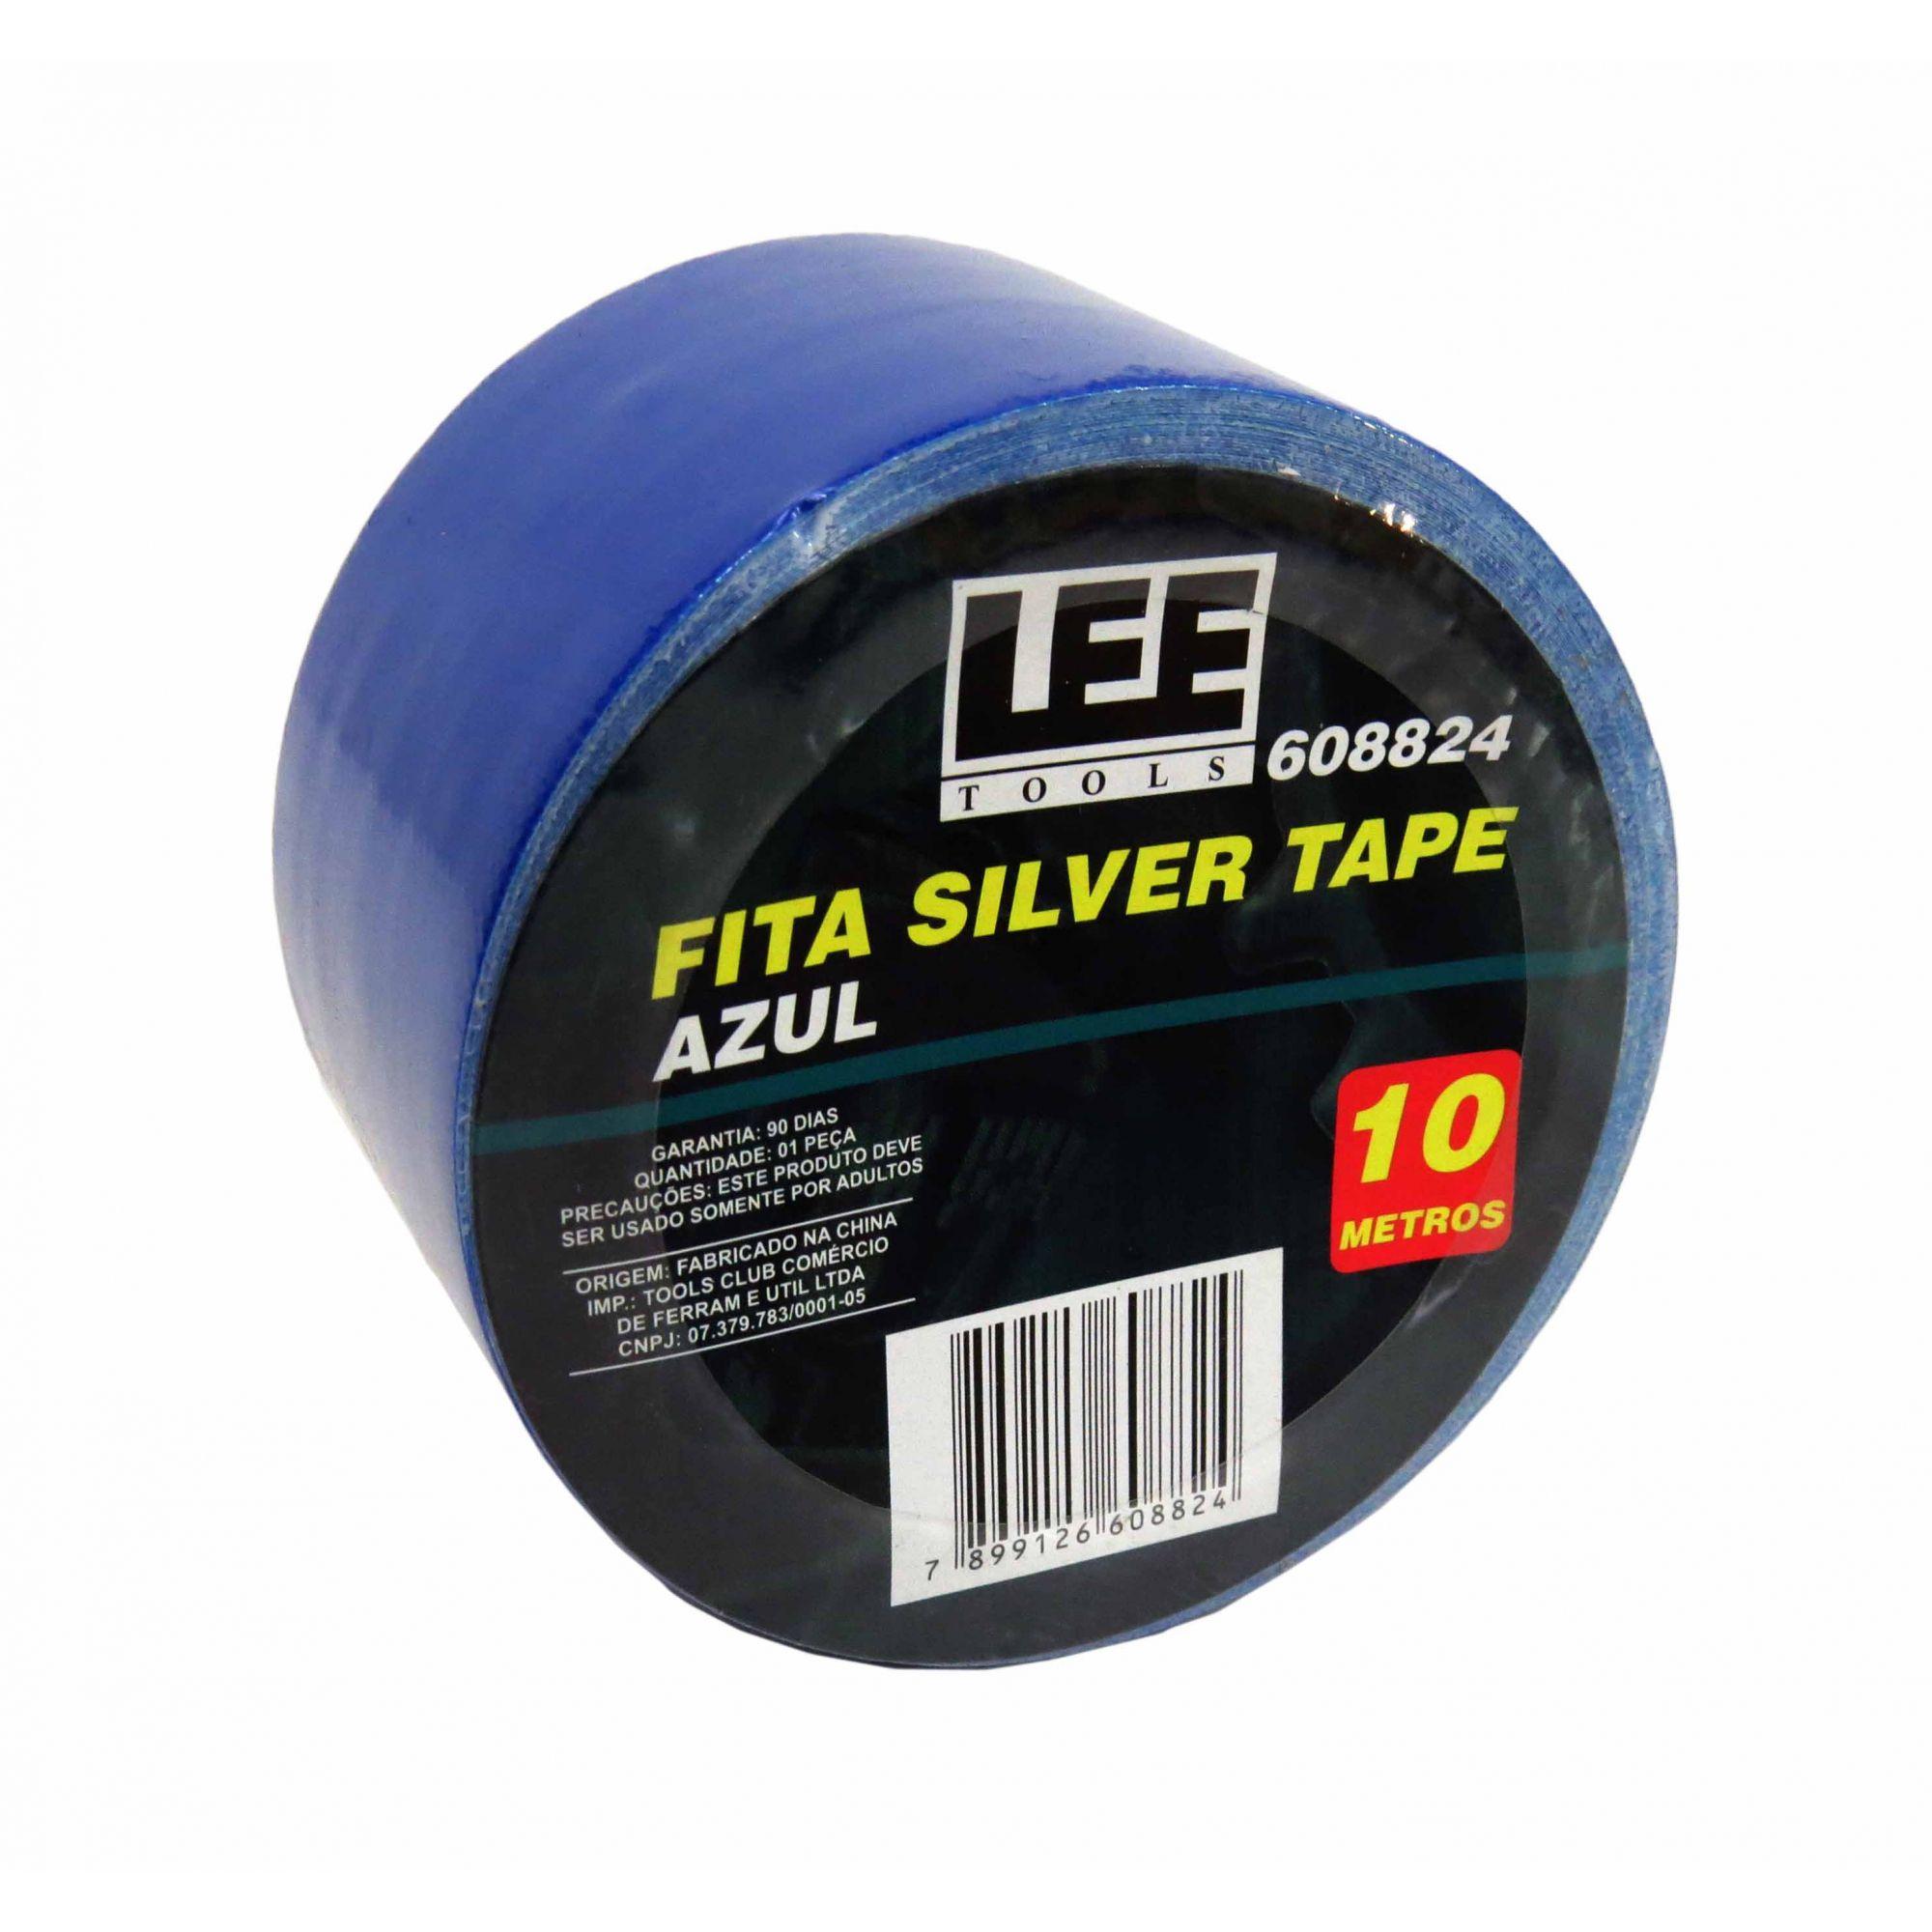 Fita Silver Tape Azul 10 Metros Leetools